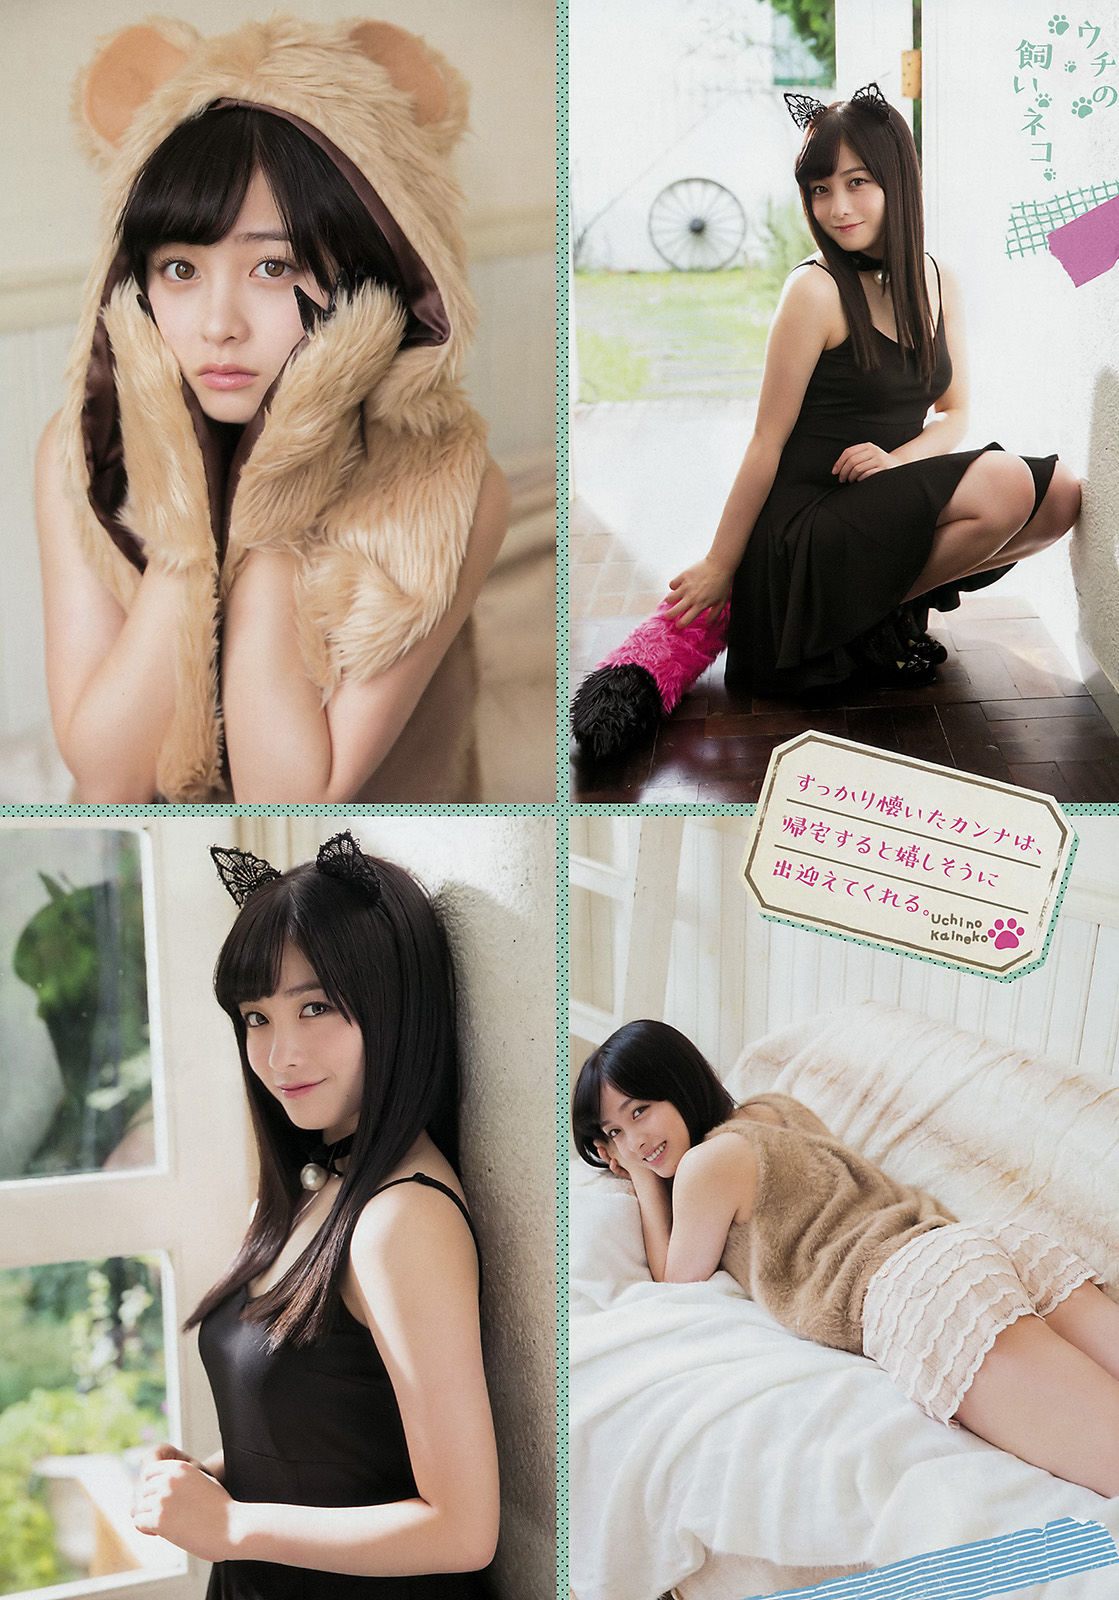 VOL.45 [Young Magazine]日本萌妹子:桥本环奈超高清写真套图(12P)